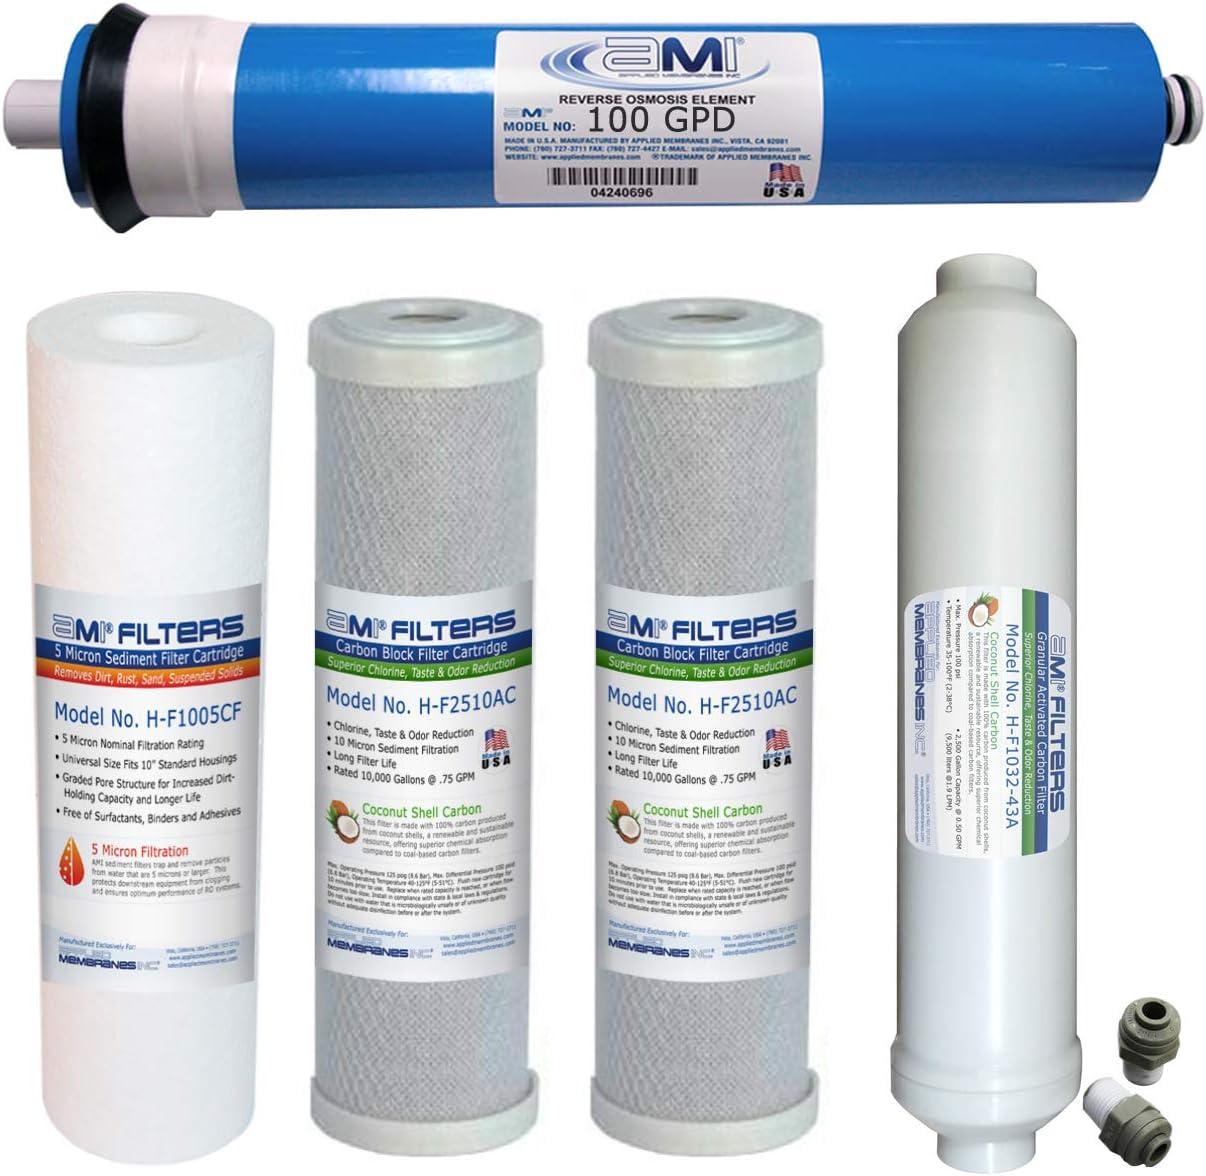 Universal 6 Wrench Set Reverse Osmosis Water Filter Pre-Filter Housing Membrane